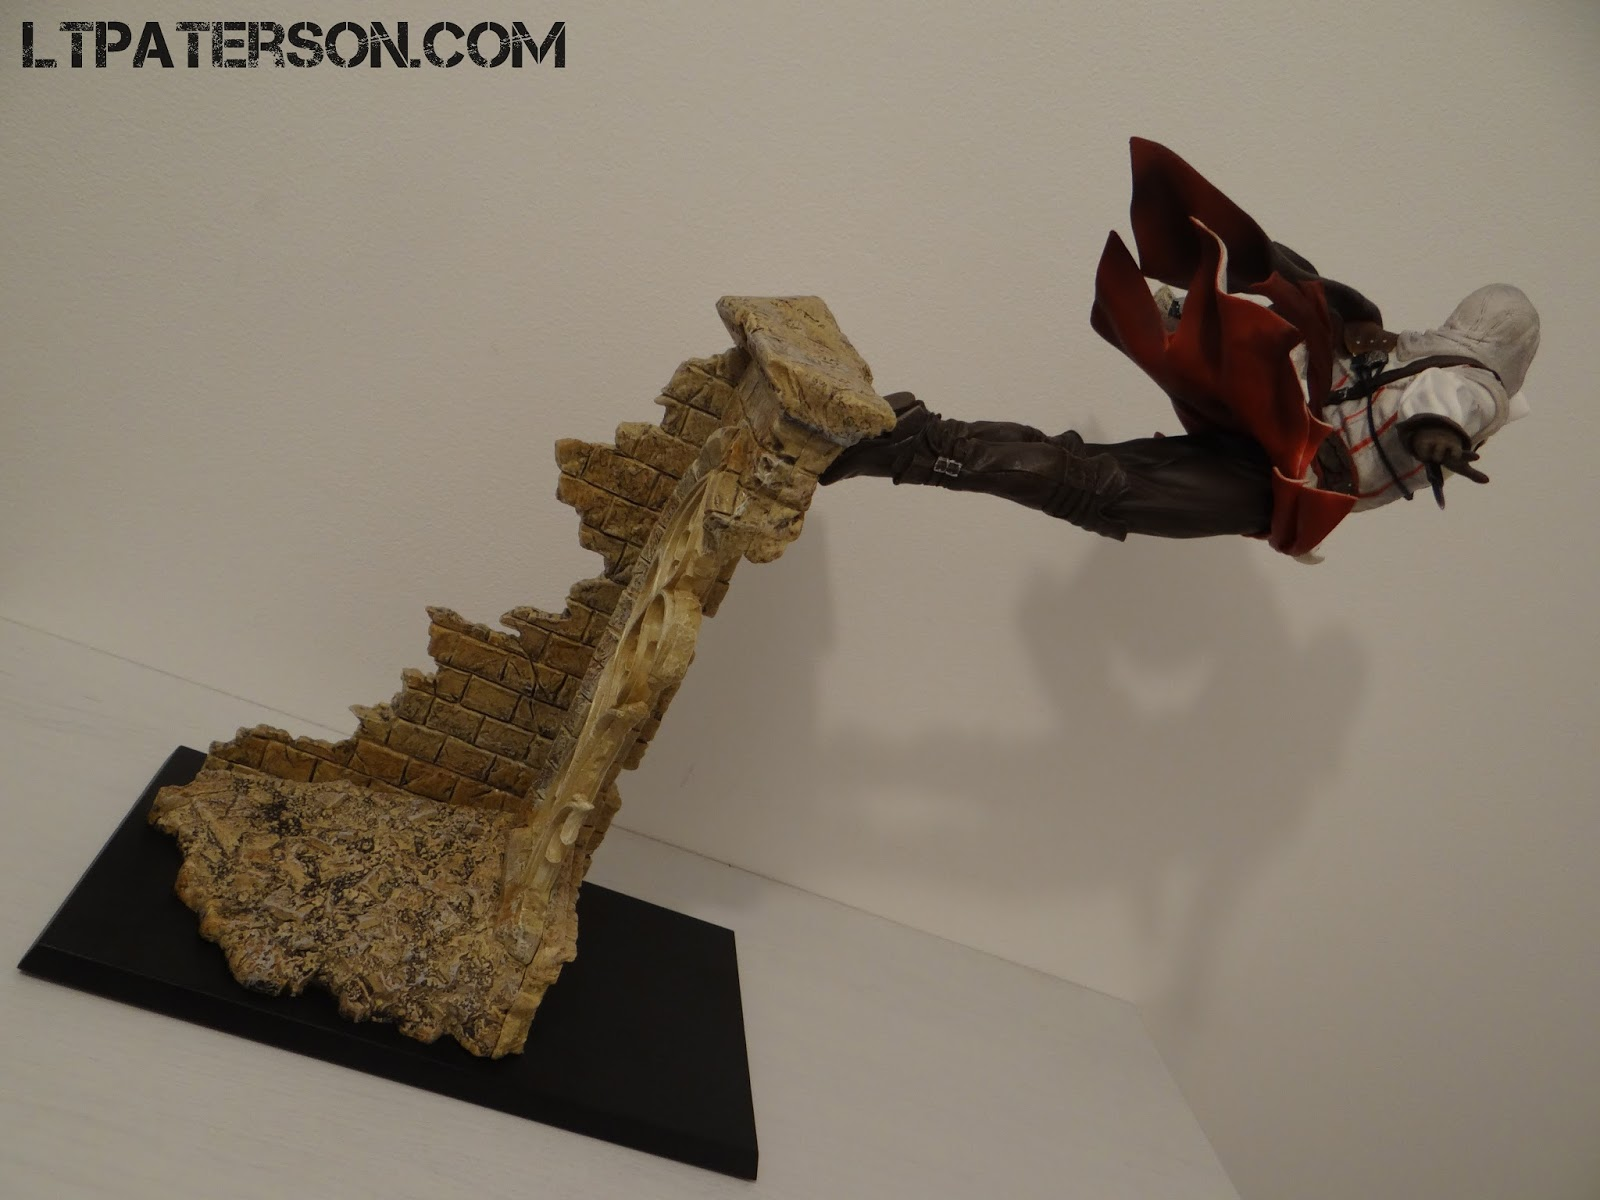 d ballage figurine ezio leap of faith assassin 39 s creed 2 blog jeux video pc. Black Bedroom Furniture Sets. Home Design Ideas